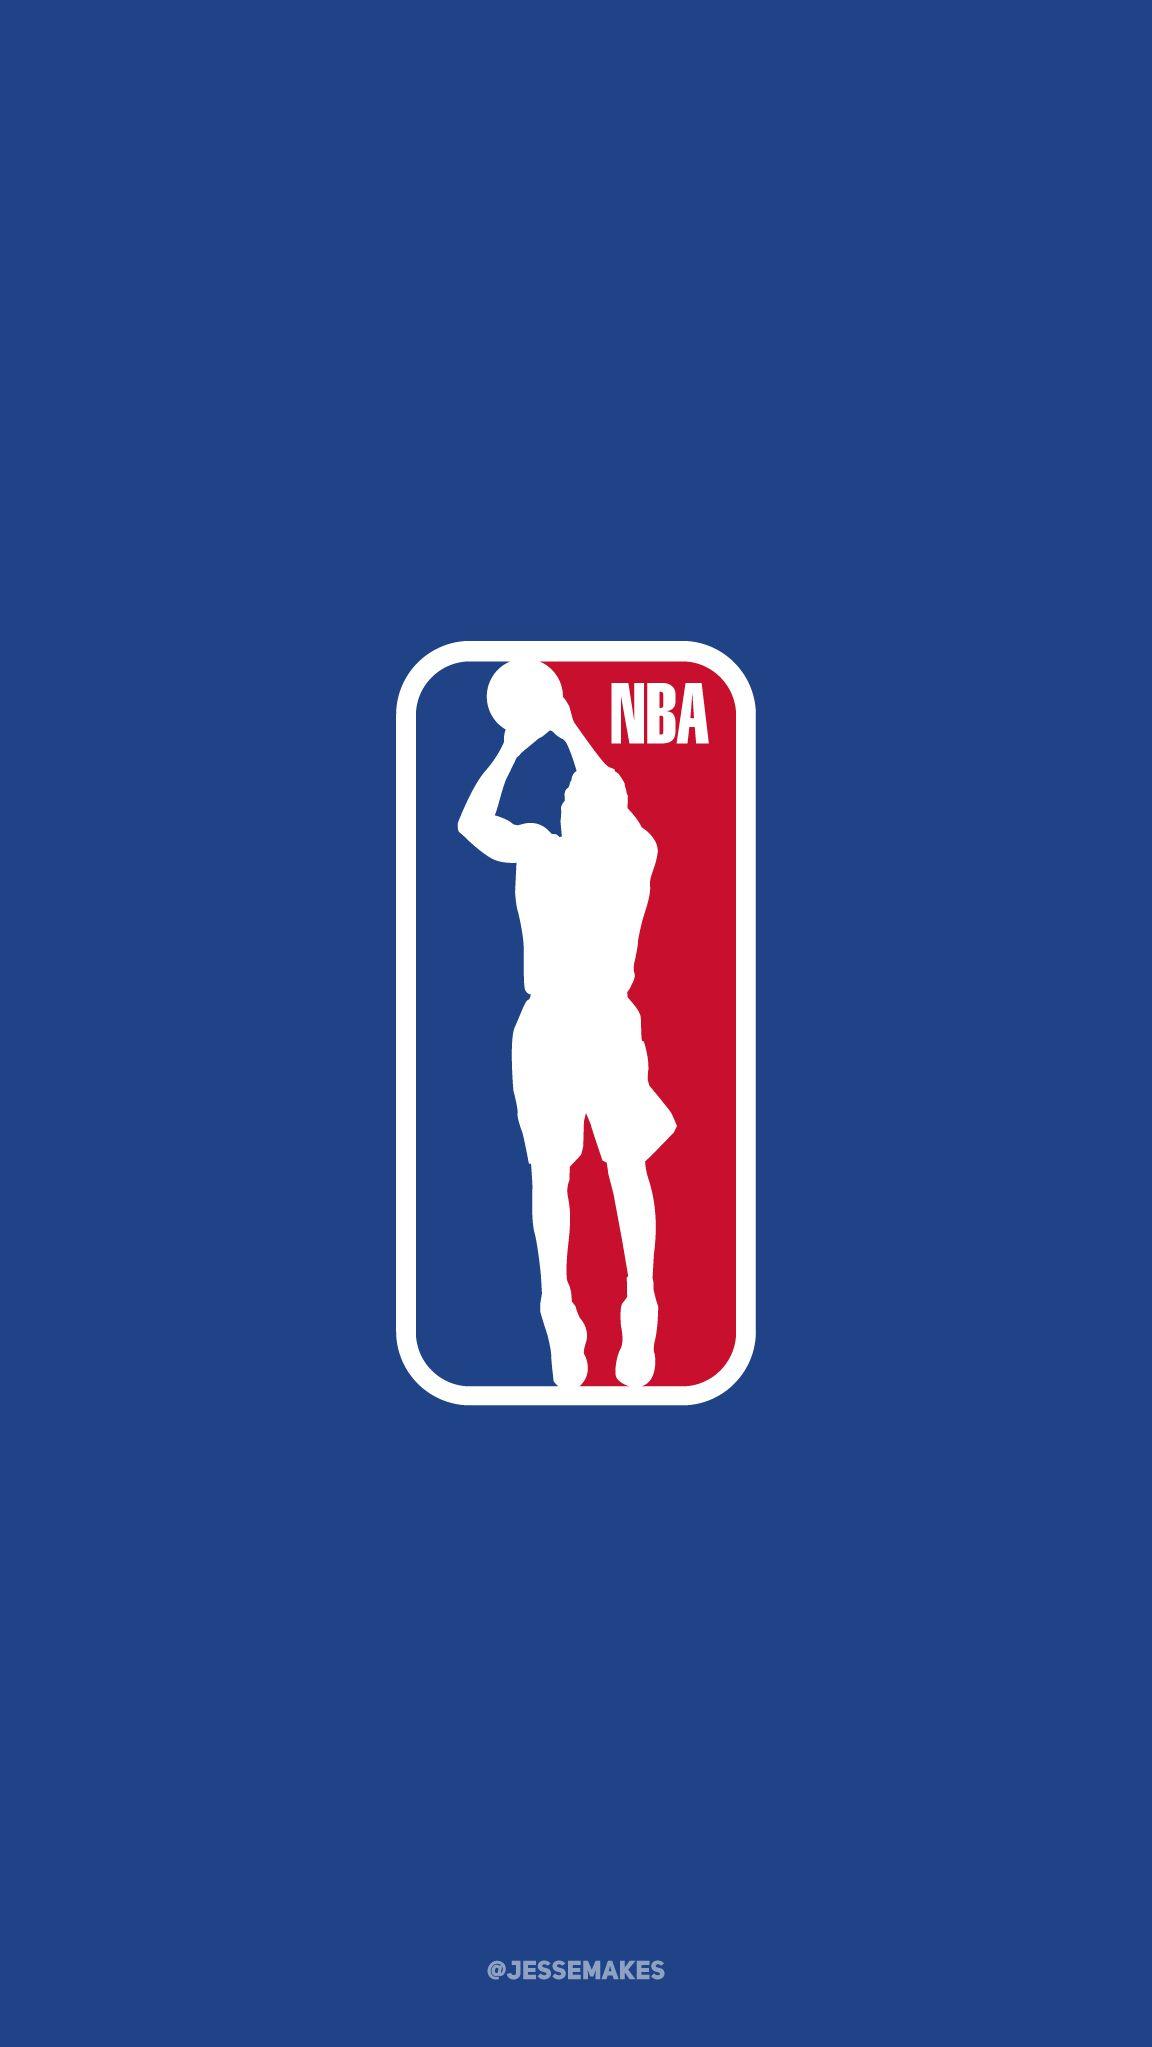 DRose as the subject of the NBA logo  Part of my NBA Logo